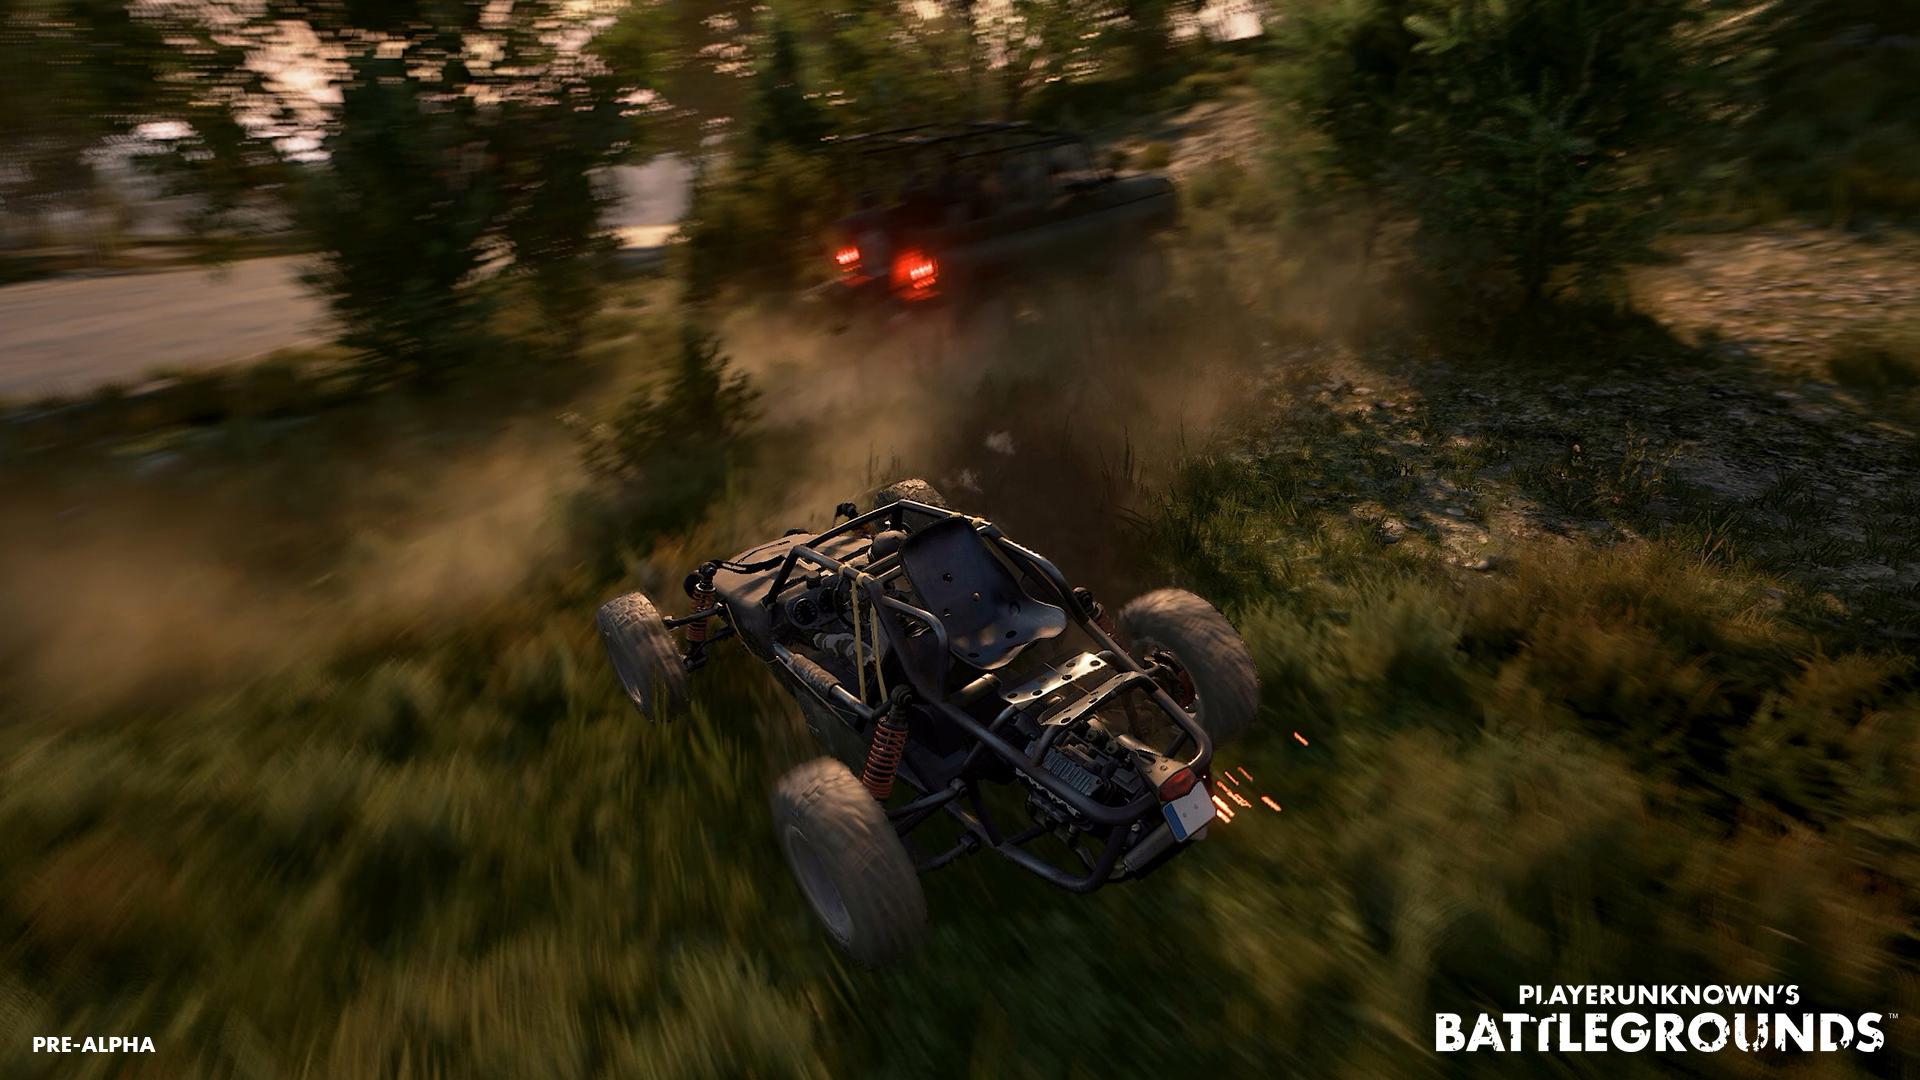 Wallpaper Engine And Pubg Playerunknown S Battlegrounds Karta Hry Games Cz